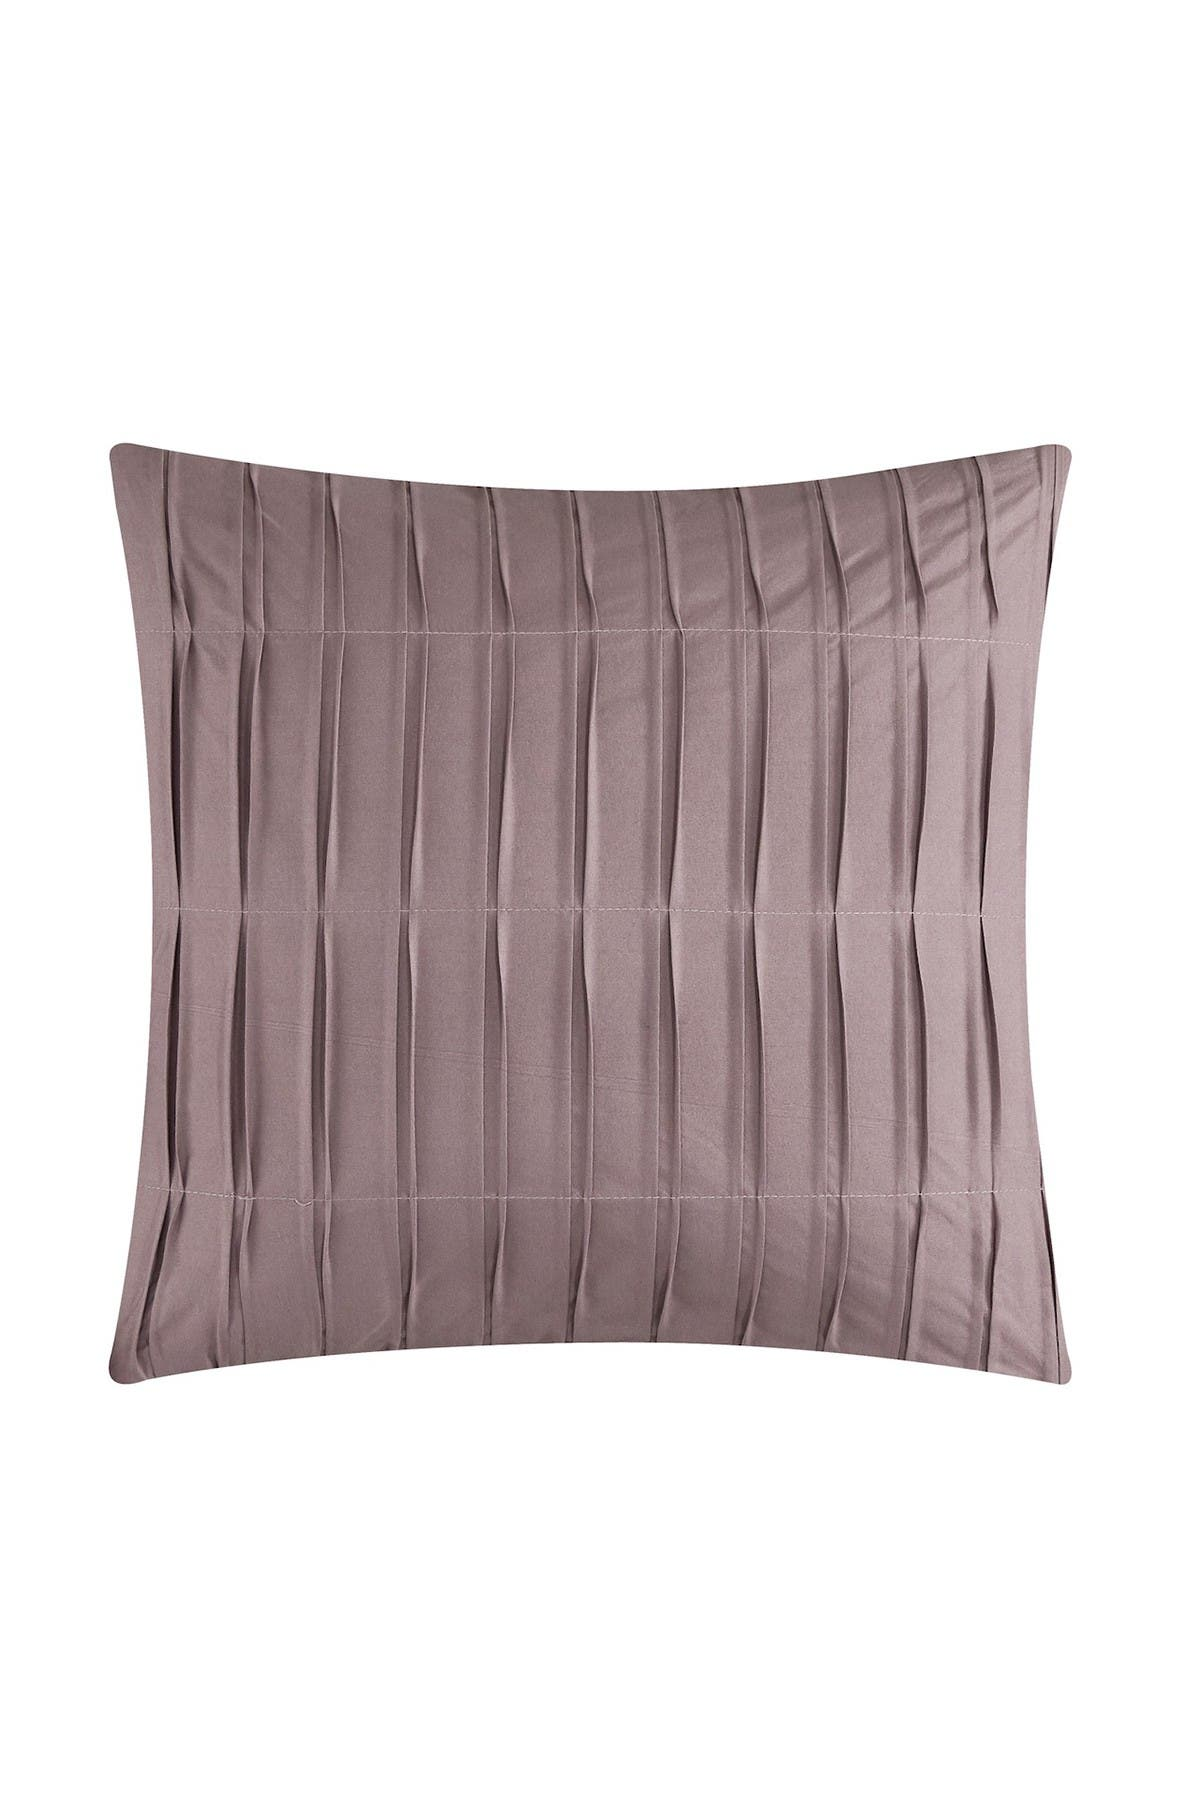 Image of Chic Home Bedding Jenson Jacquard Geometric Design King Comforter Set - Plum - 5-Piece Set